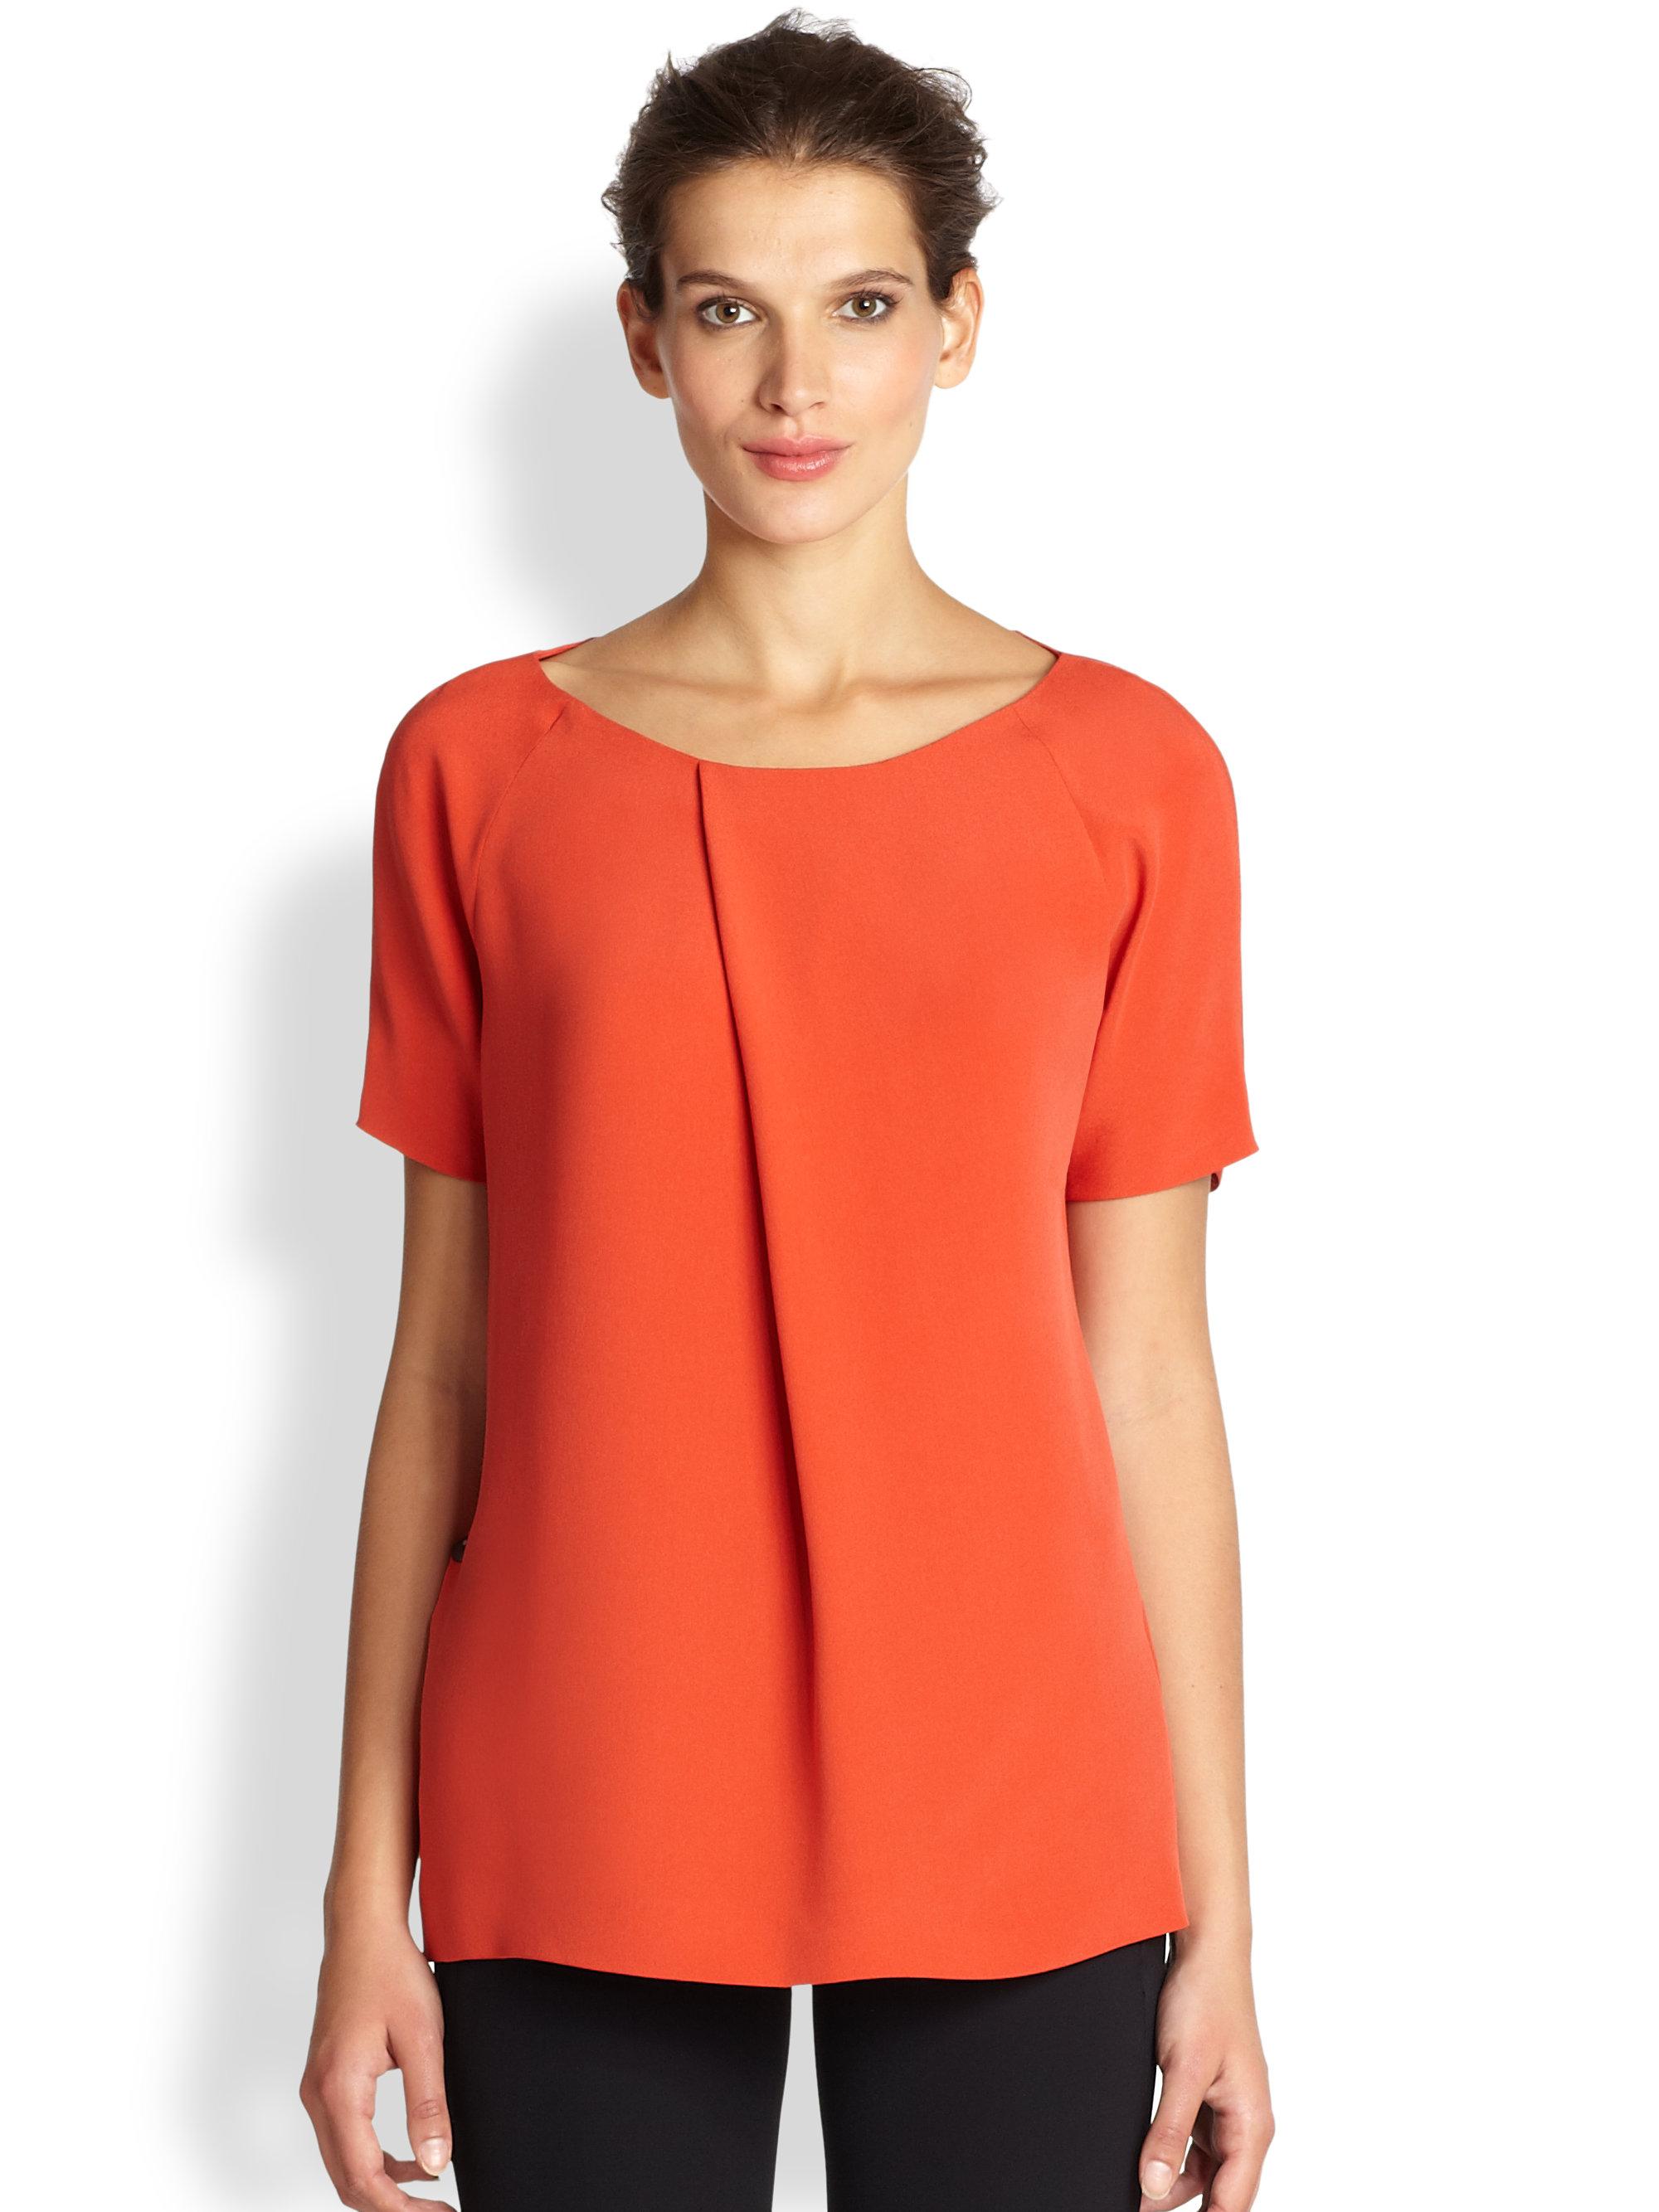 b0841954fdf5b2 Delightful Orange Silk Saree 168471 At 43 69